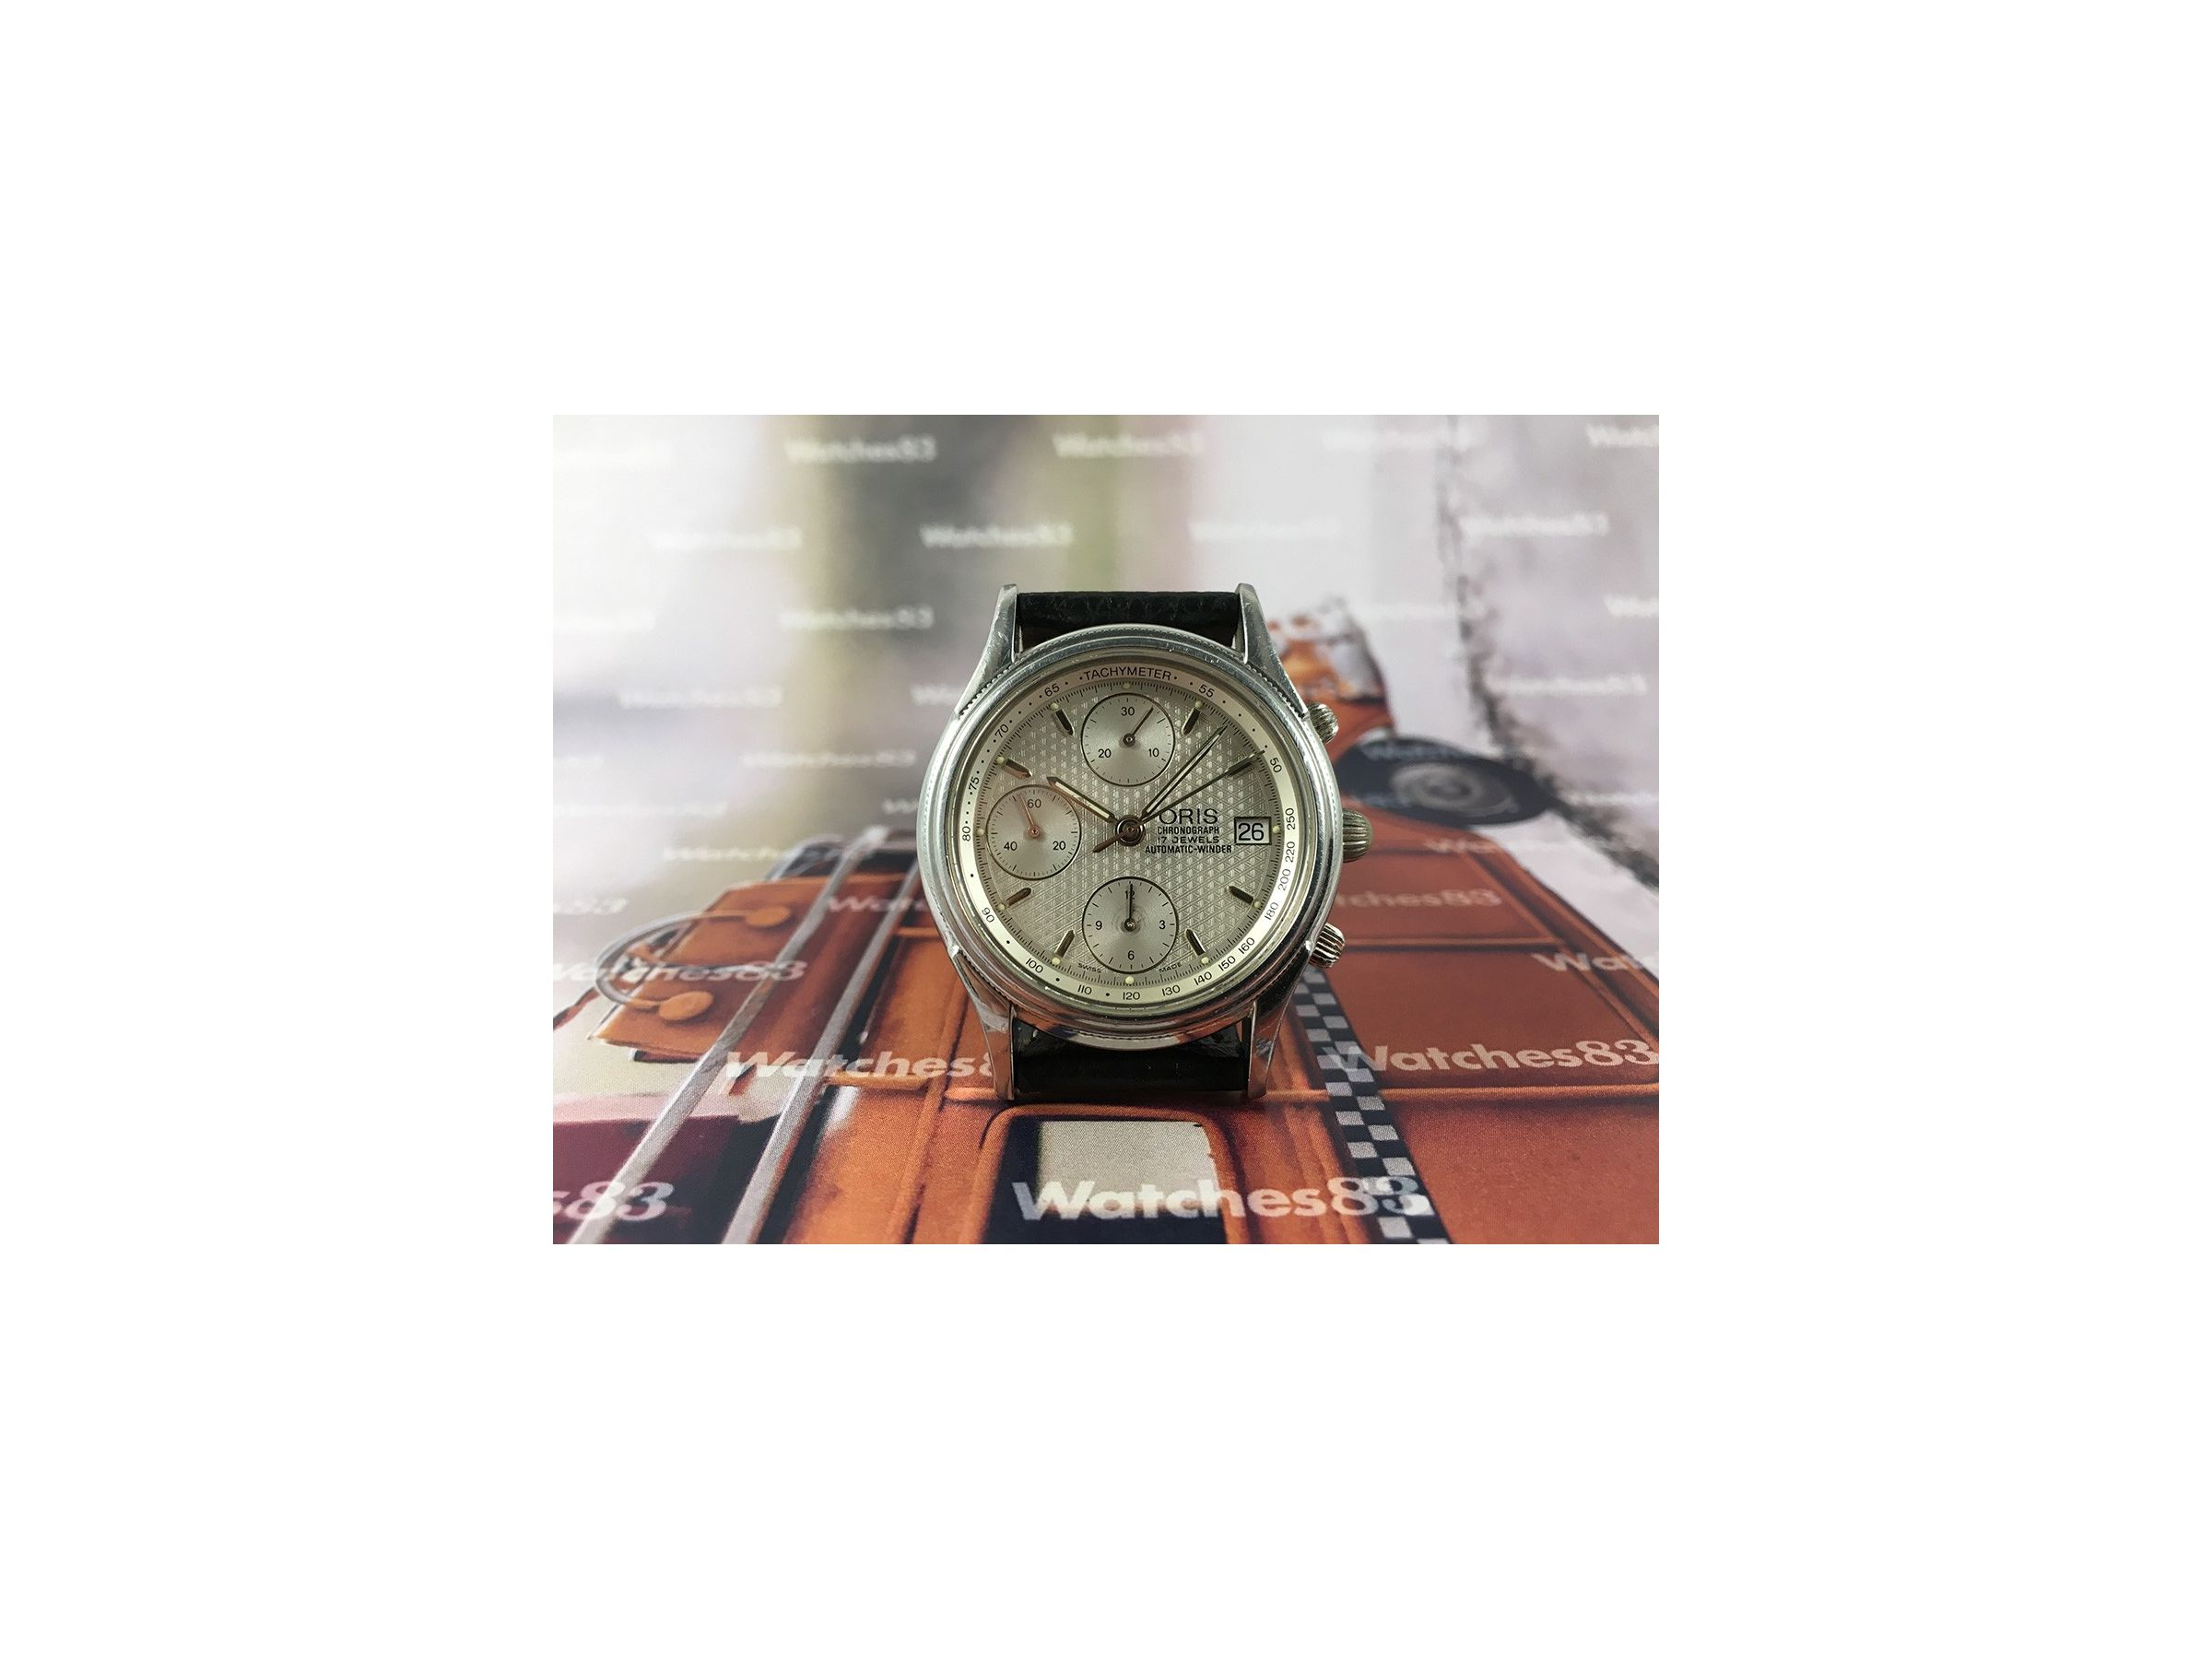 Vintage Swiss Cronograph Watch Oris Automatic Winder 17 Jewels Oris Vintage Watches Watches83